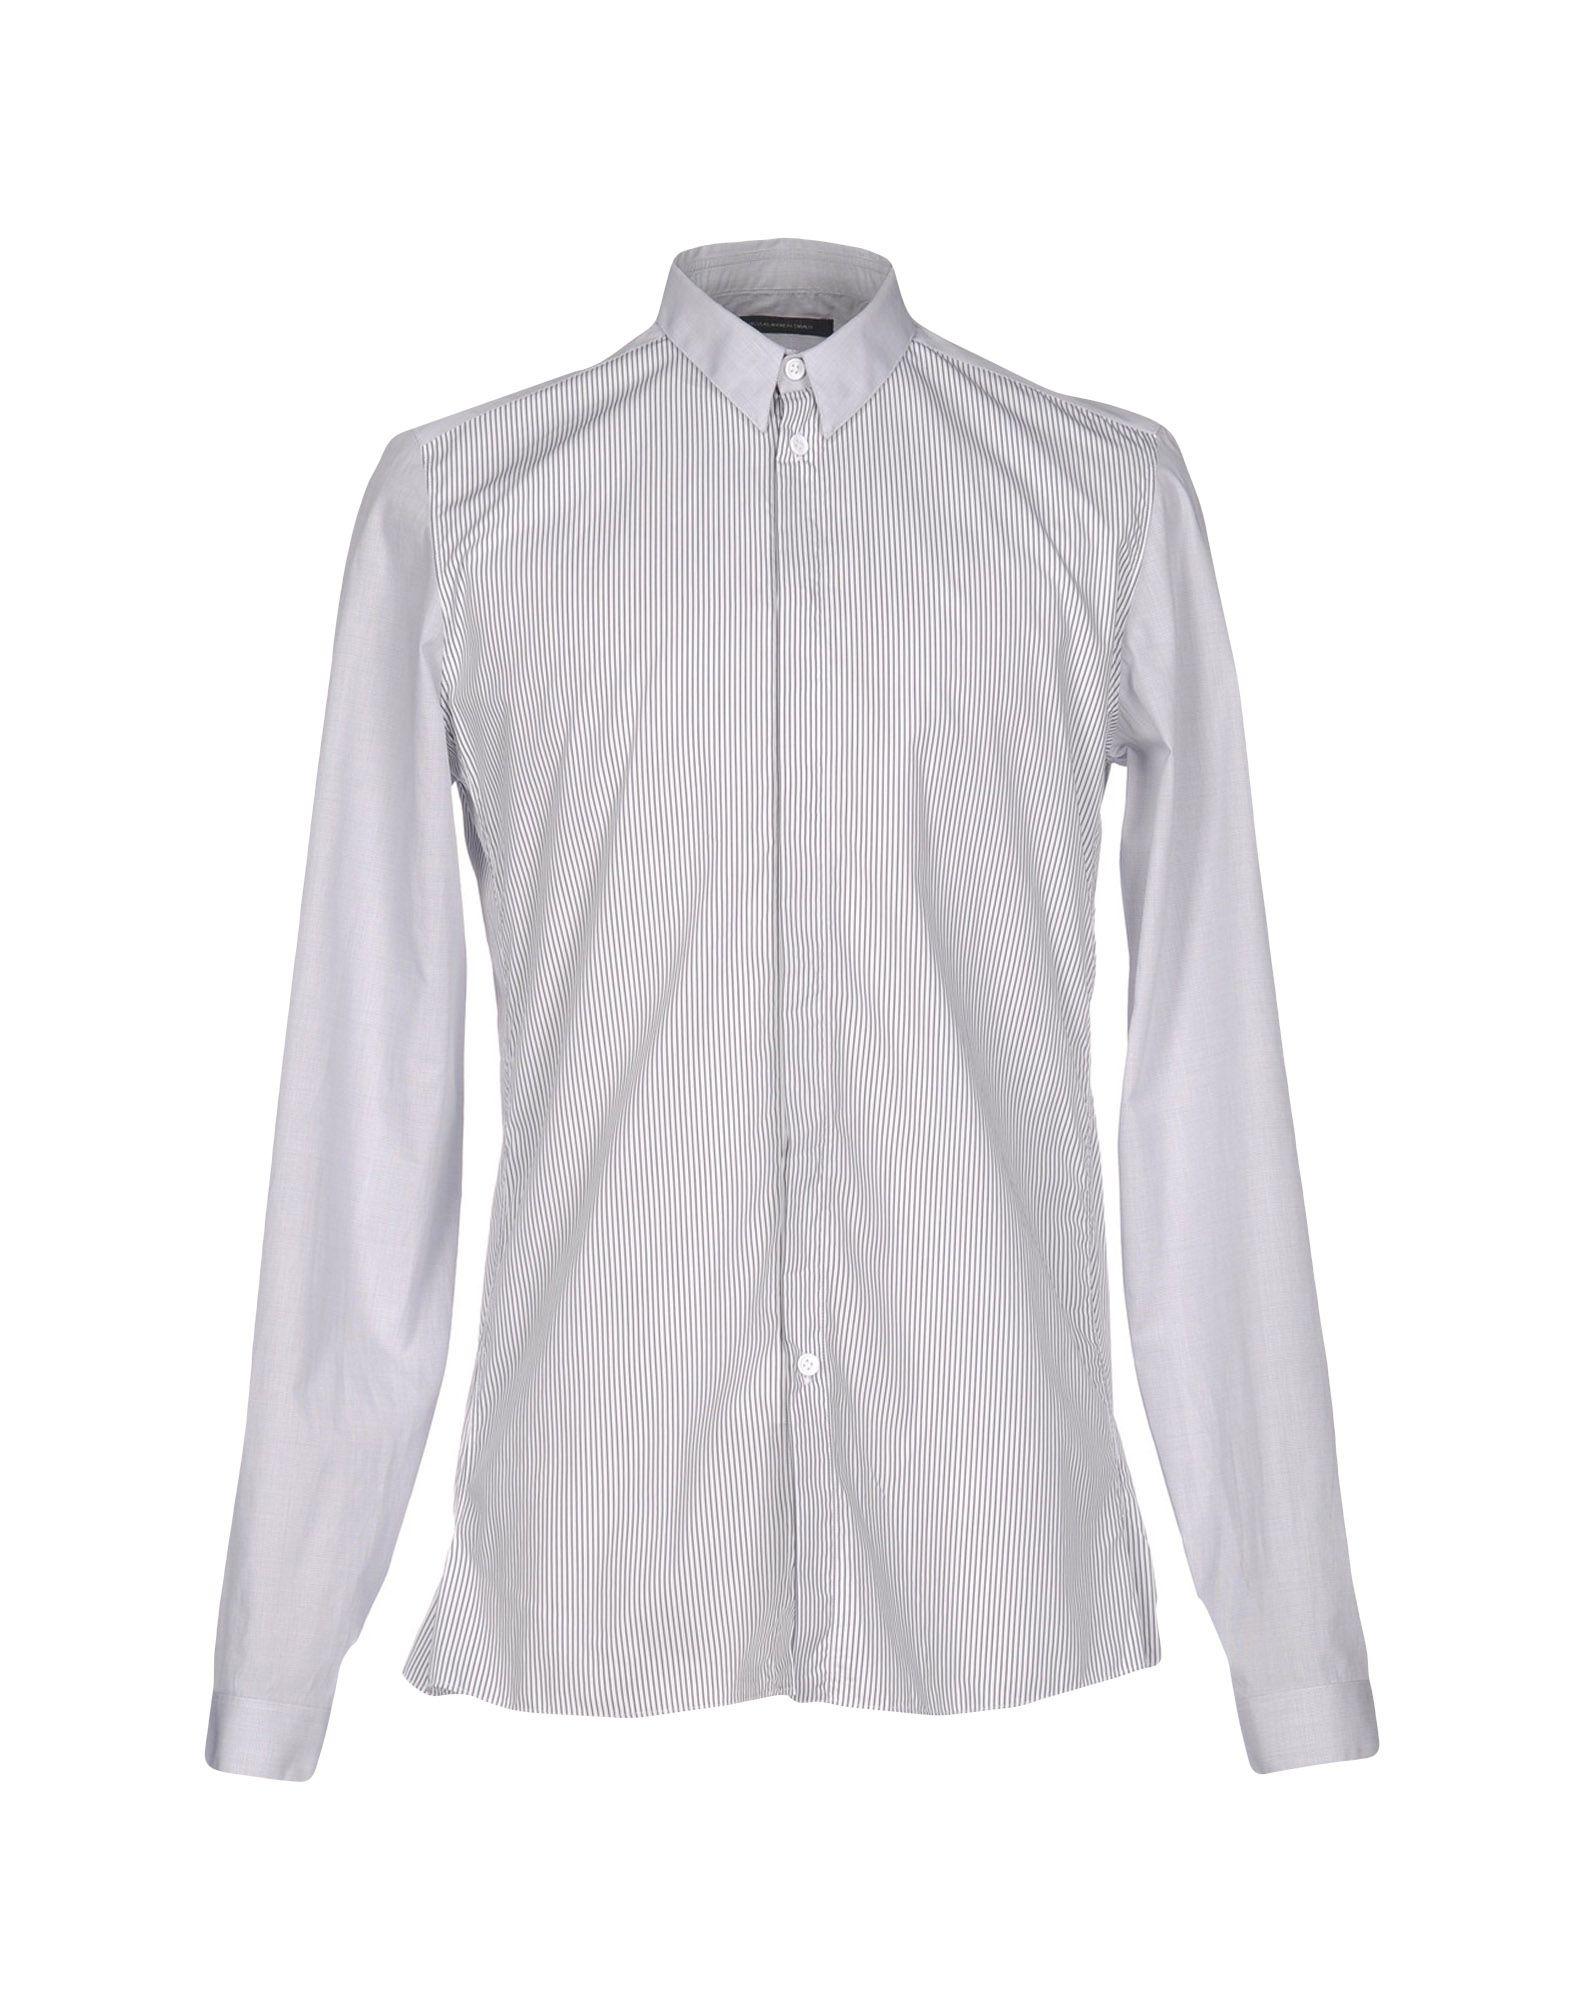 NICOLAS ANDREAS TARALIS Pубашка цены онлайн